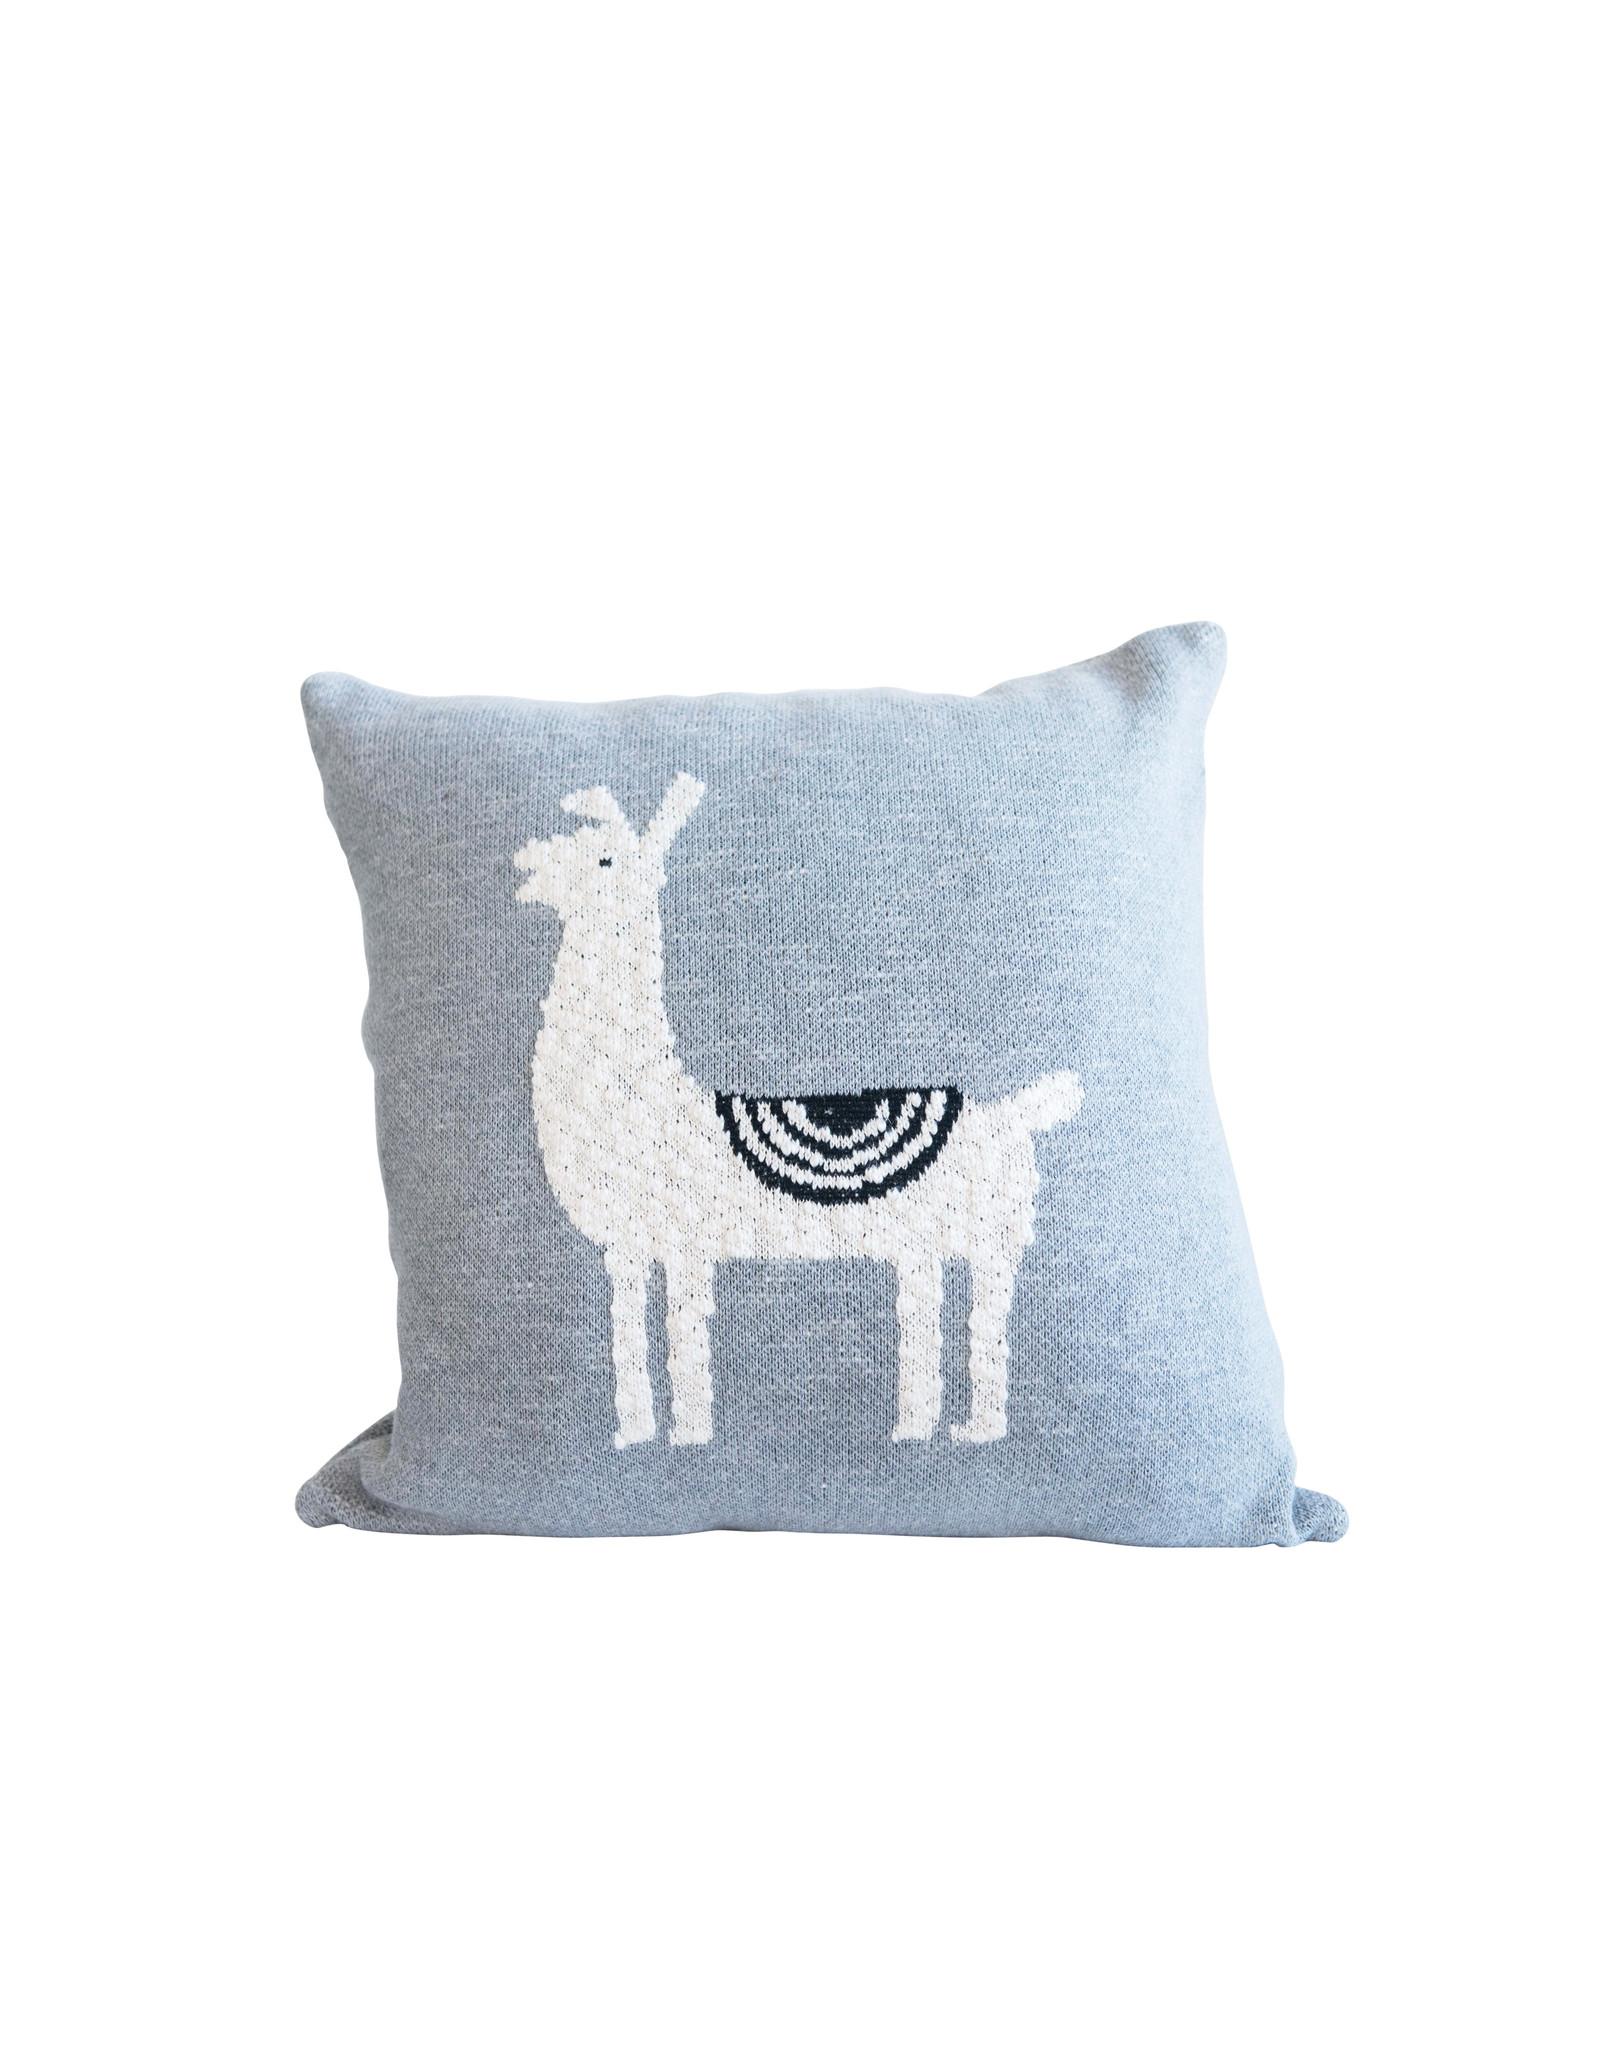 Square Cotton Knit Grey Square Llama Pillow